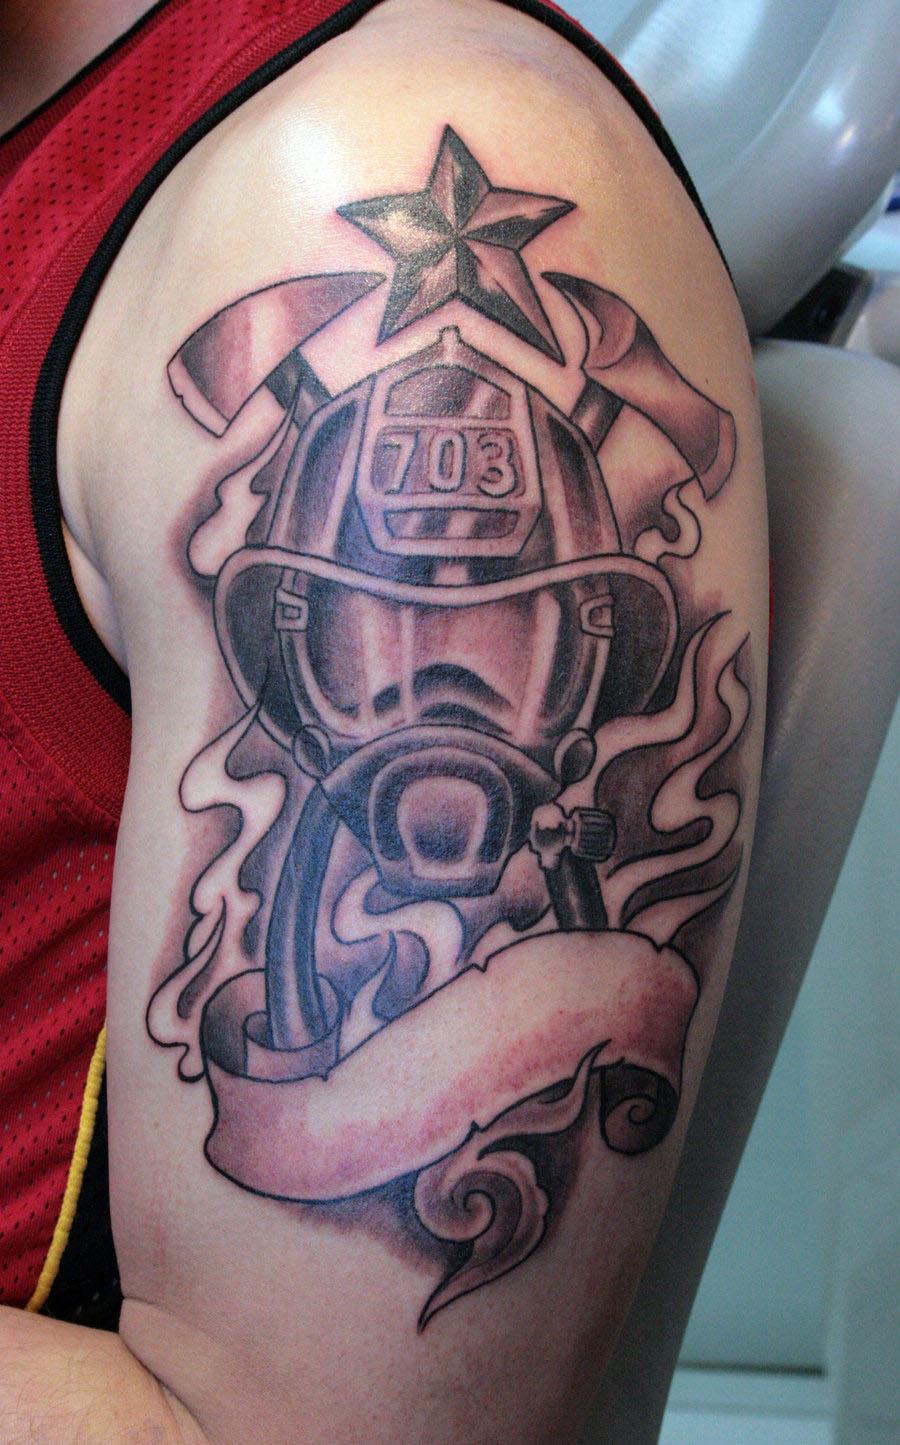 firefighter tattoos 3d tattoo new. Black Bedroom Furniture Sets. Home Design Ideas